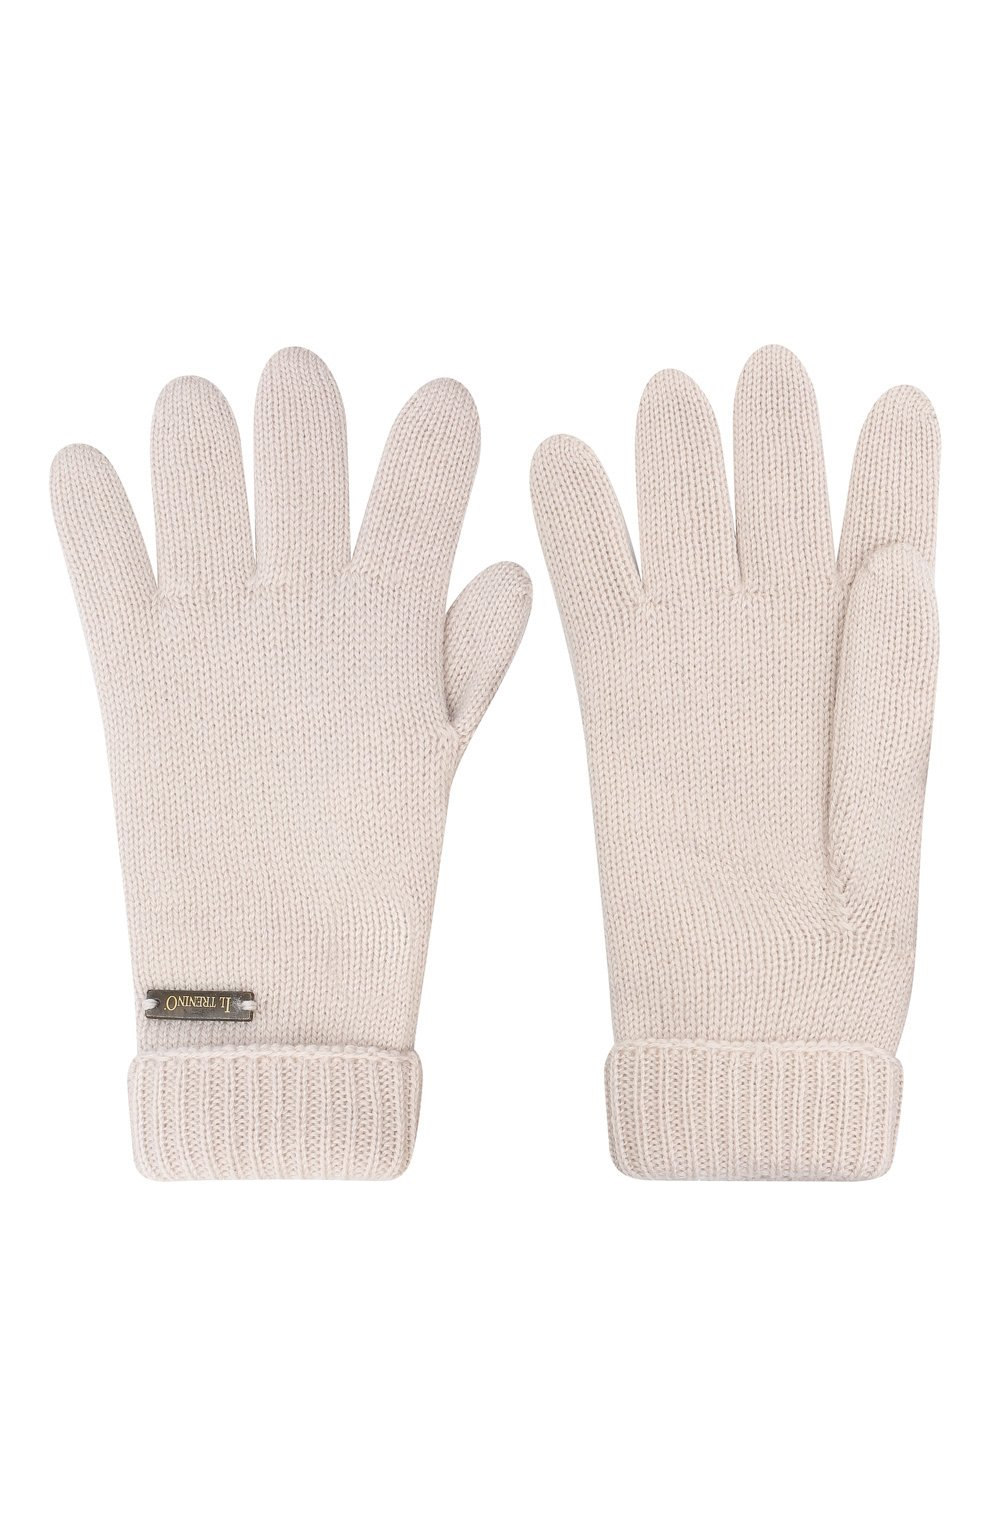 Детские шерстяные перчатки IL TRENINO бежевого цвета, арт. 20 4063/E0 | Фото 2